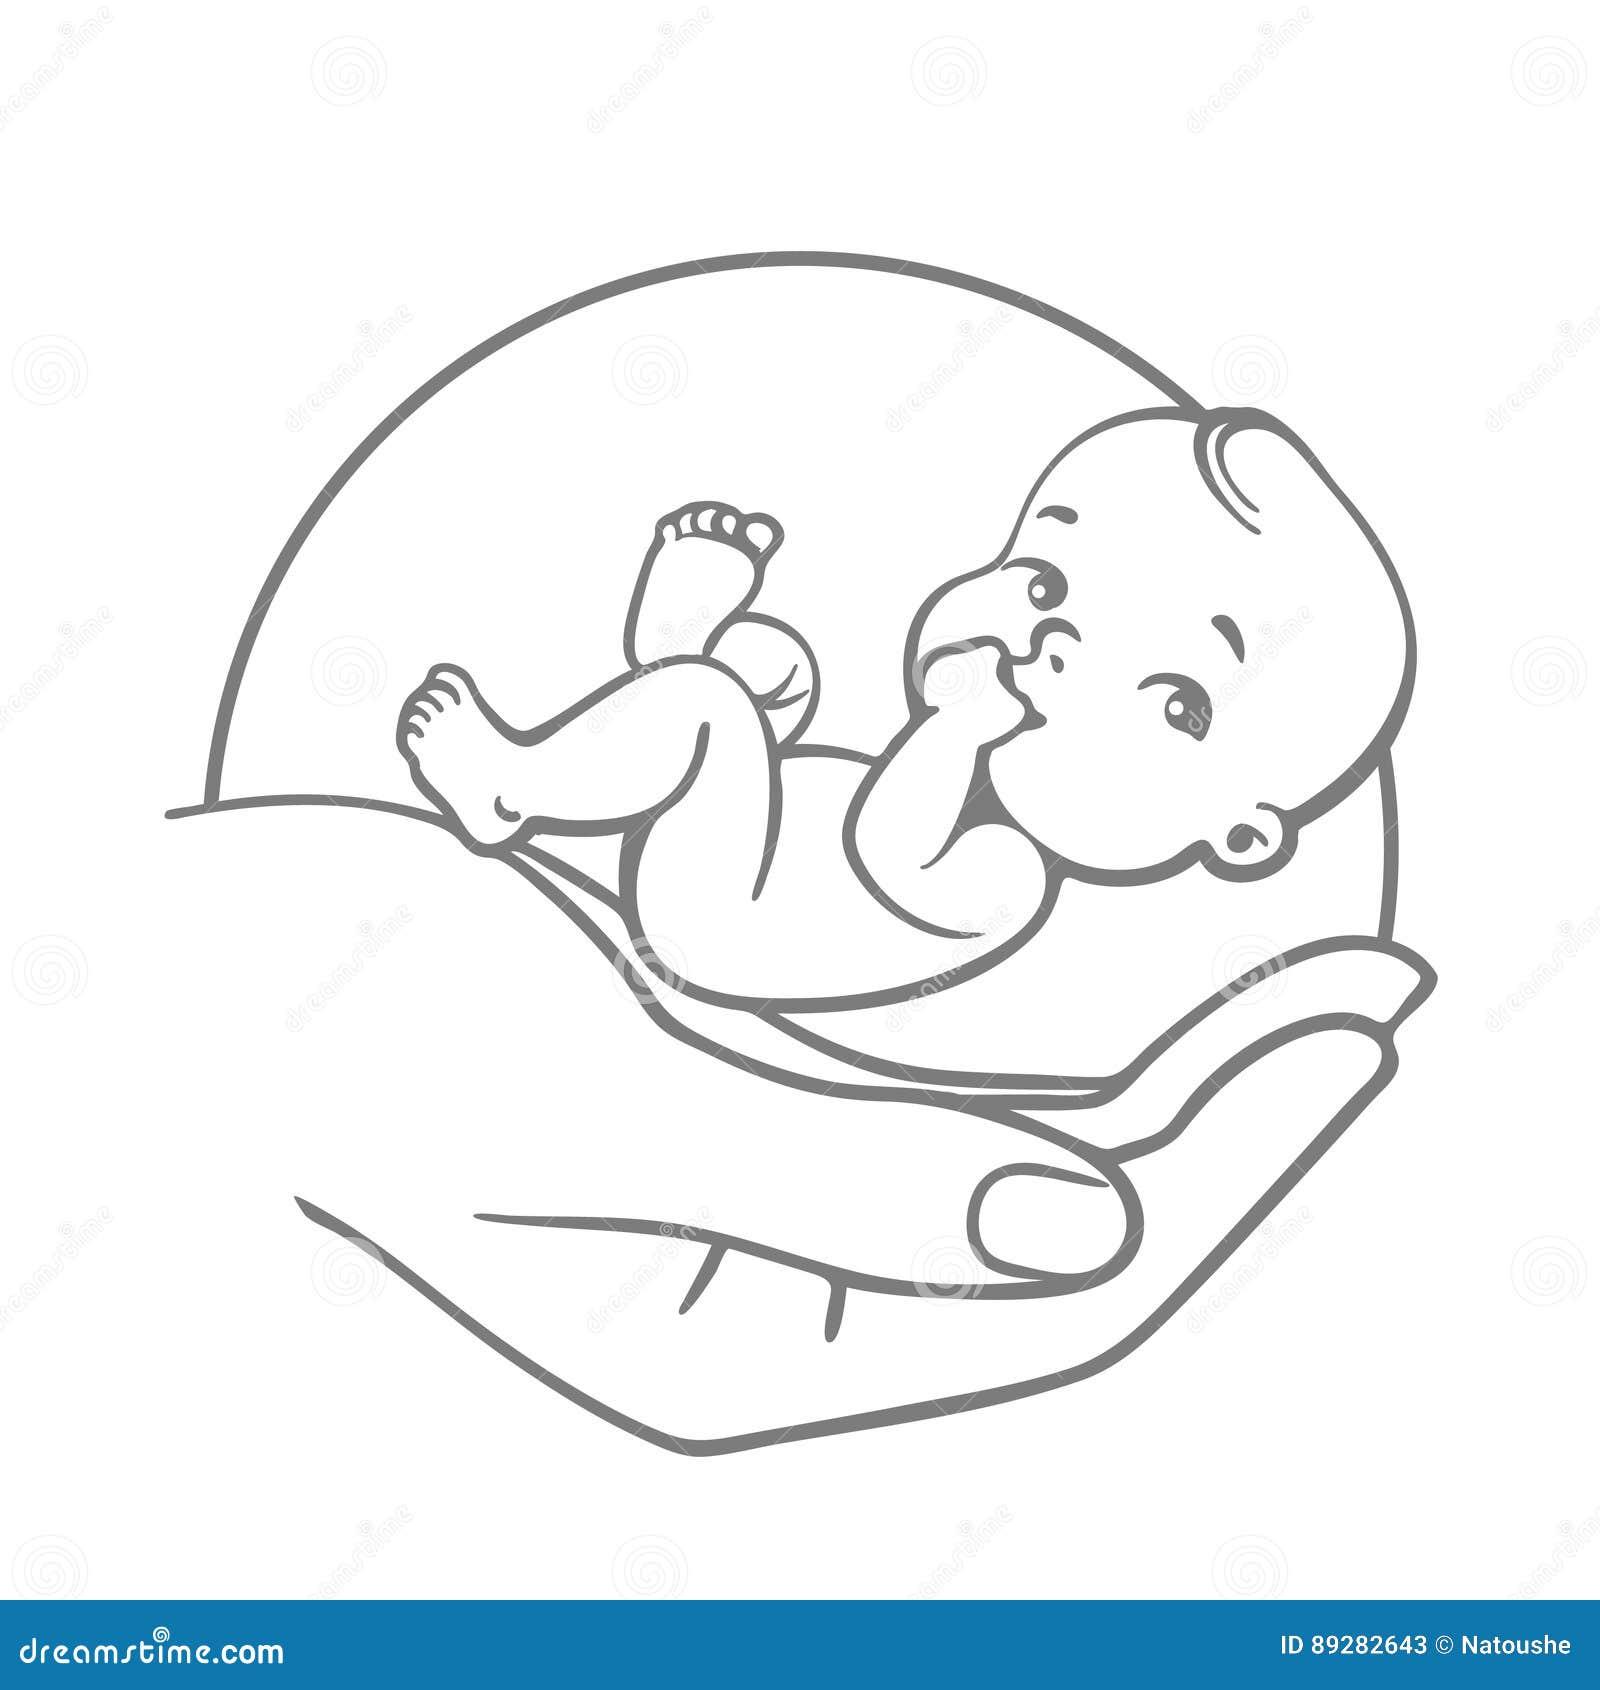 Baby Care Logo Stock Vector Illustration Of Child Logo 89282643